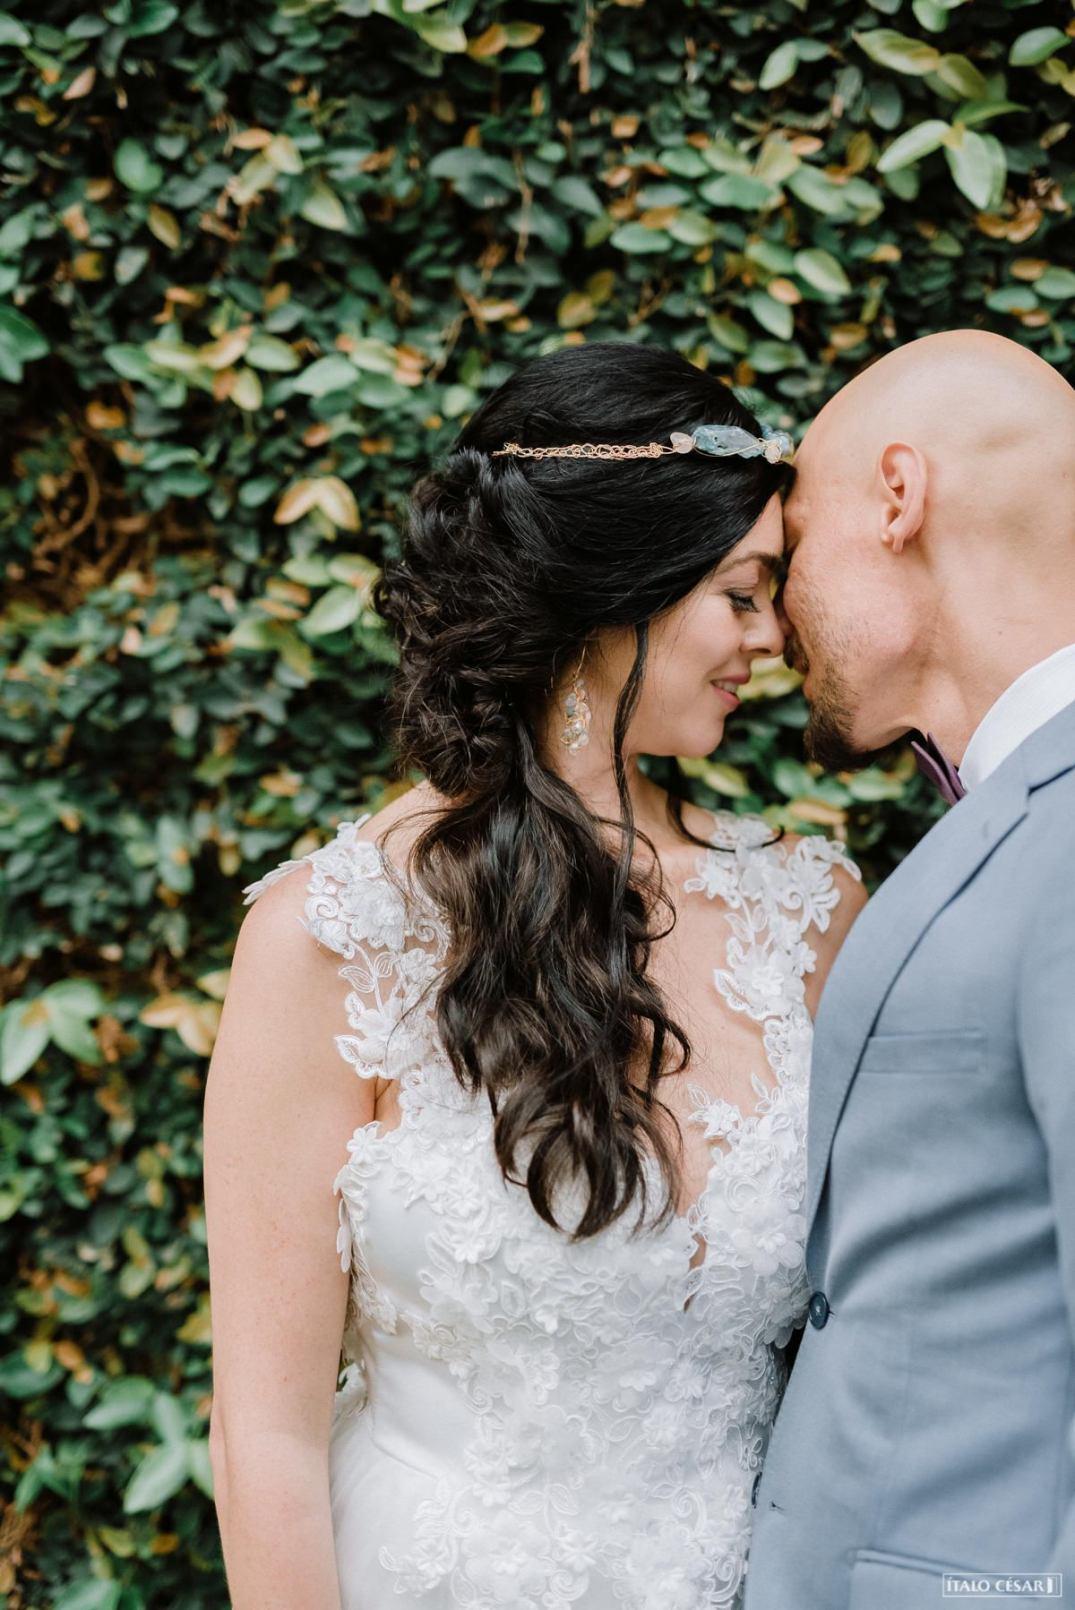 italocesar-elopement-wedding-casamento-a-dois-rede-globo-mais-voce-anamariabraga-daniel-daniela-0078